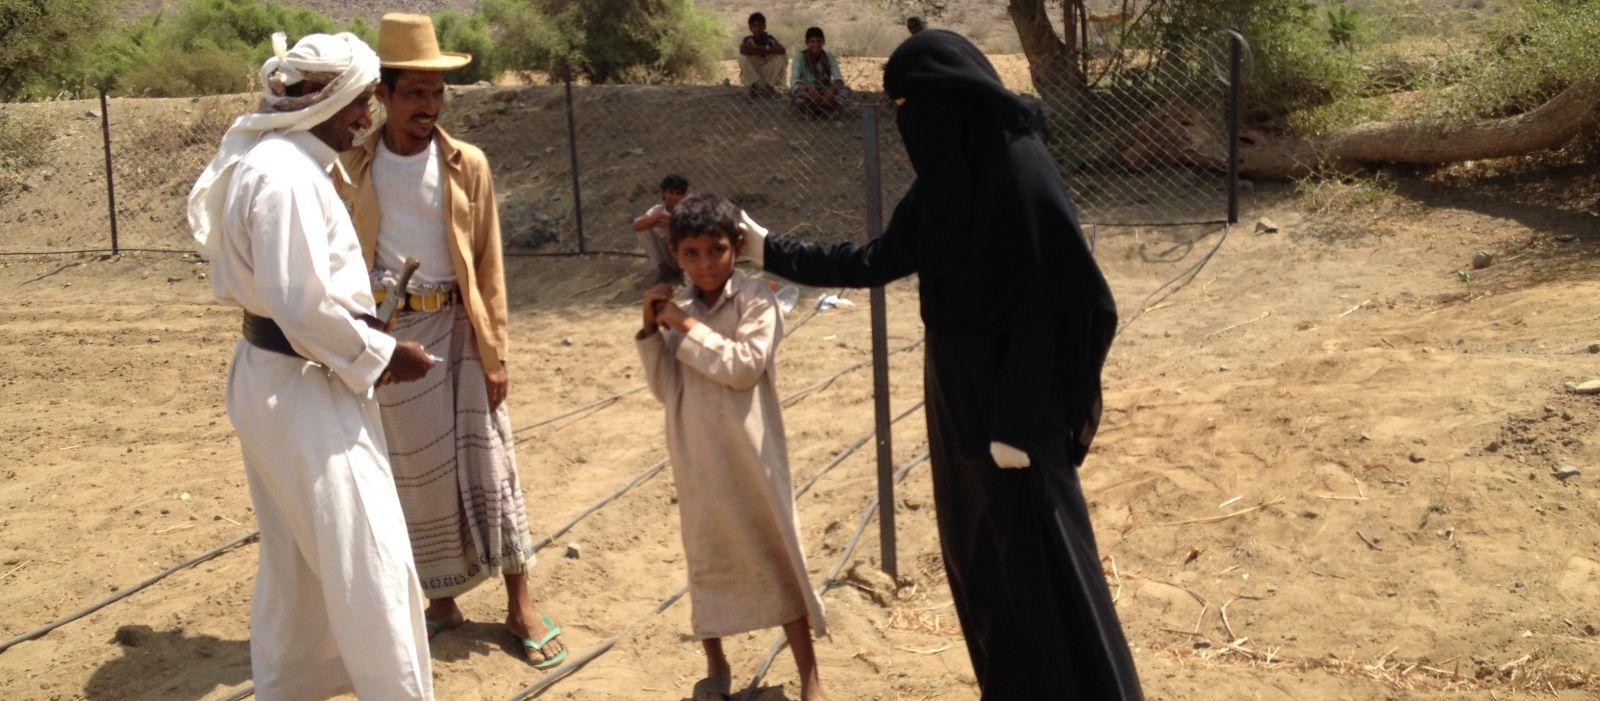 Yemen: A forgotten crisis